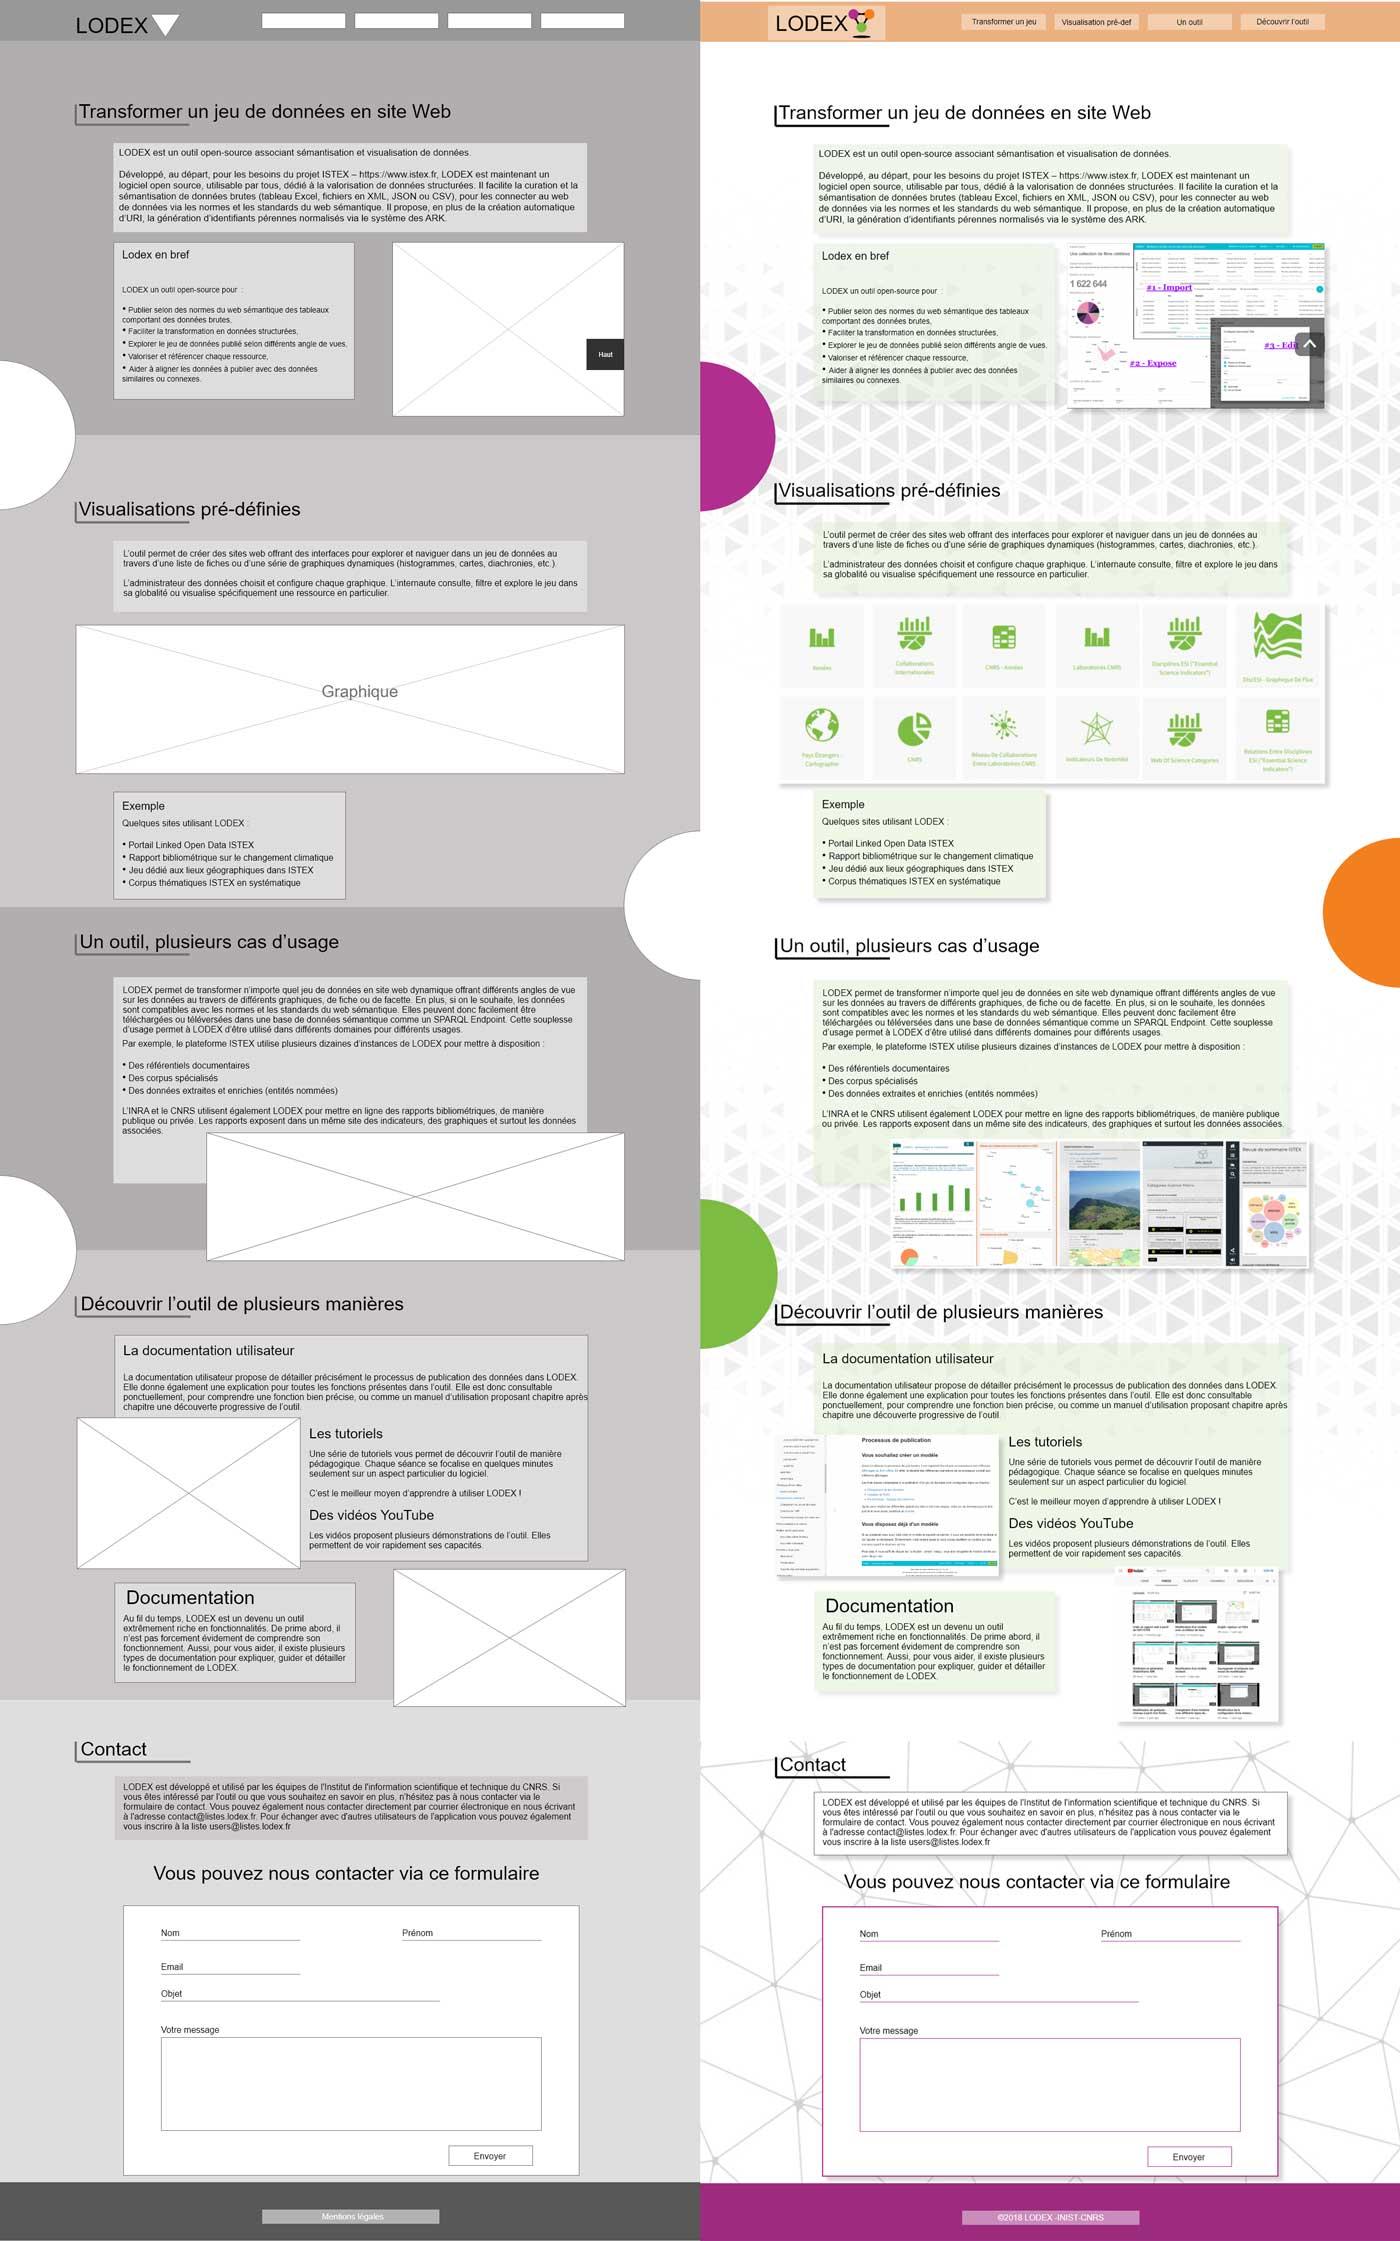 UI design UX design - Gobelins